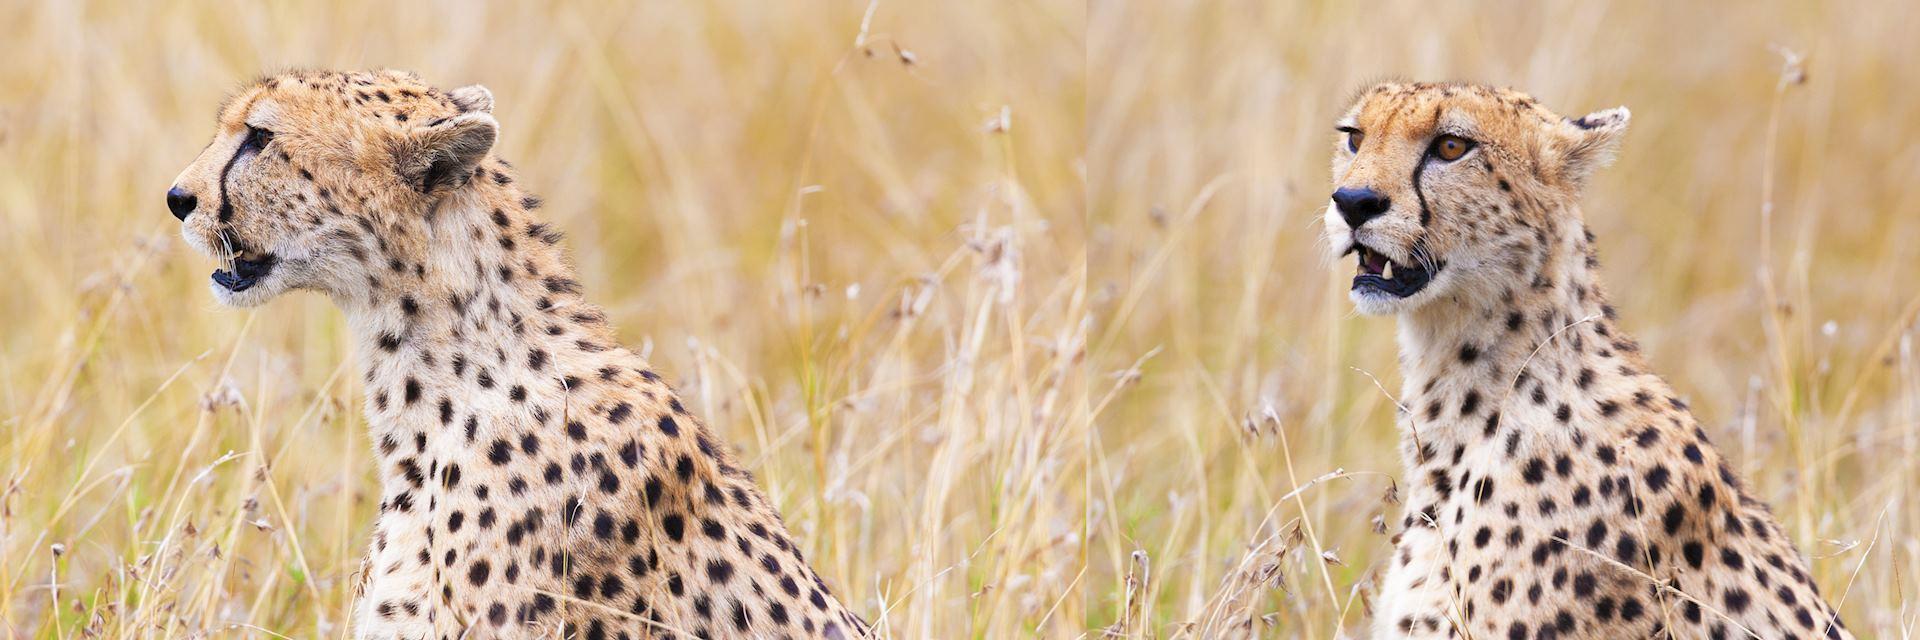 Cheetah in Shaba National Reserve